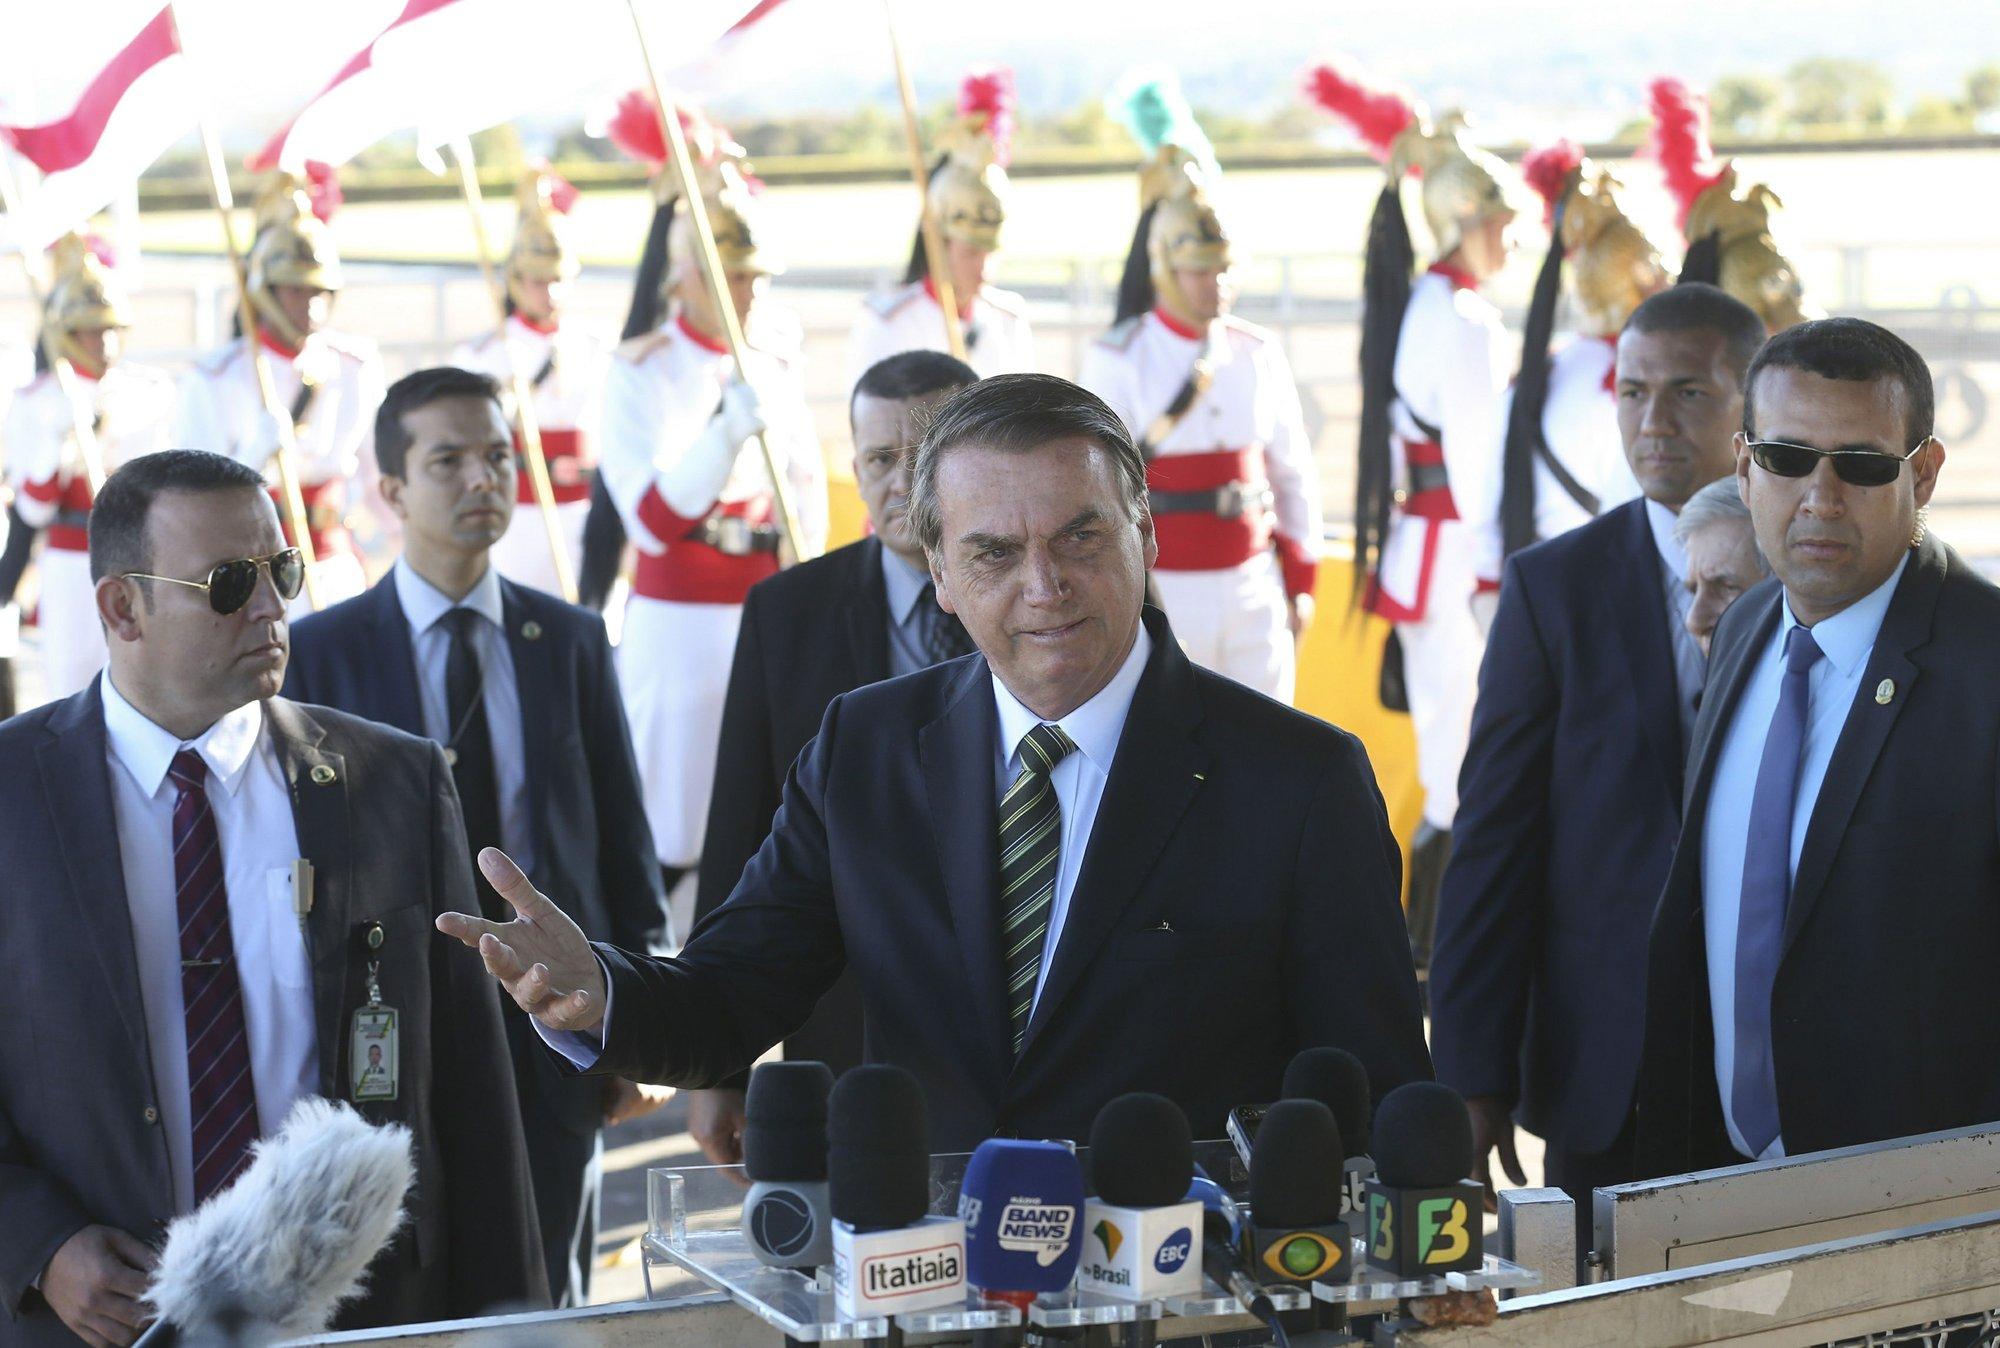 The Latest: Brazil leader criticizes indigenous reserves